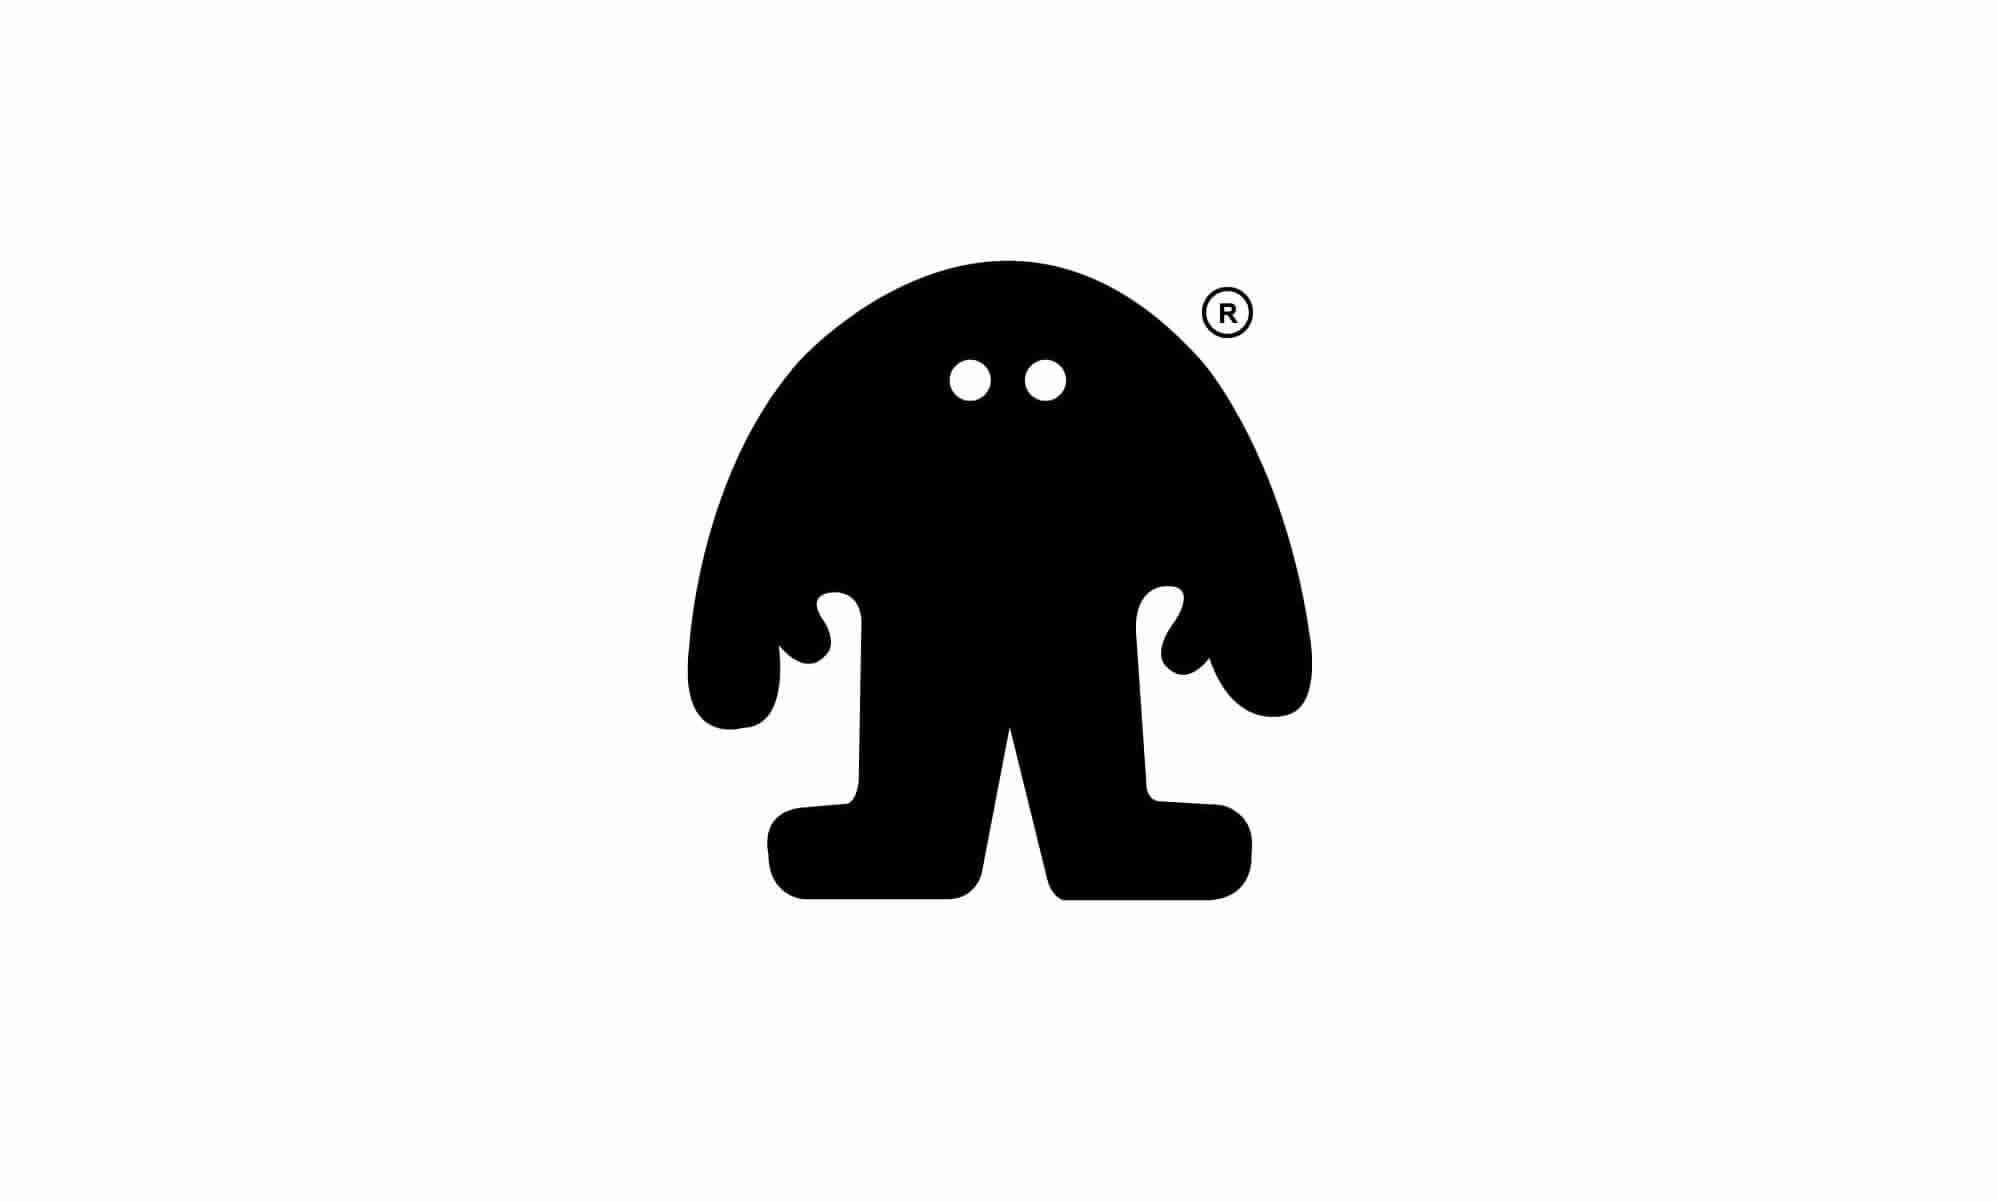 Designer Interview With James Martin - The Logo Creative